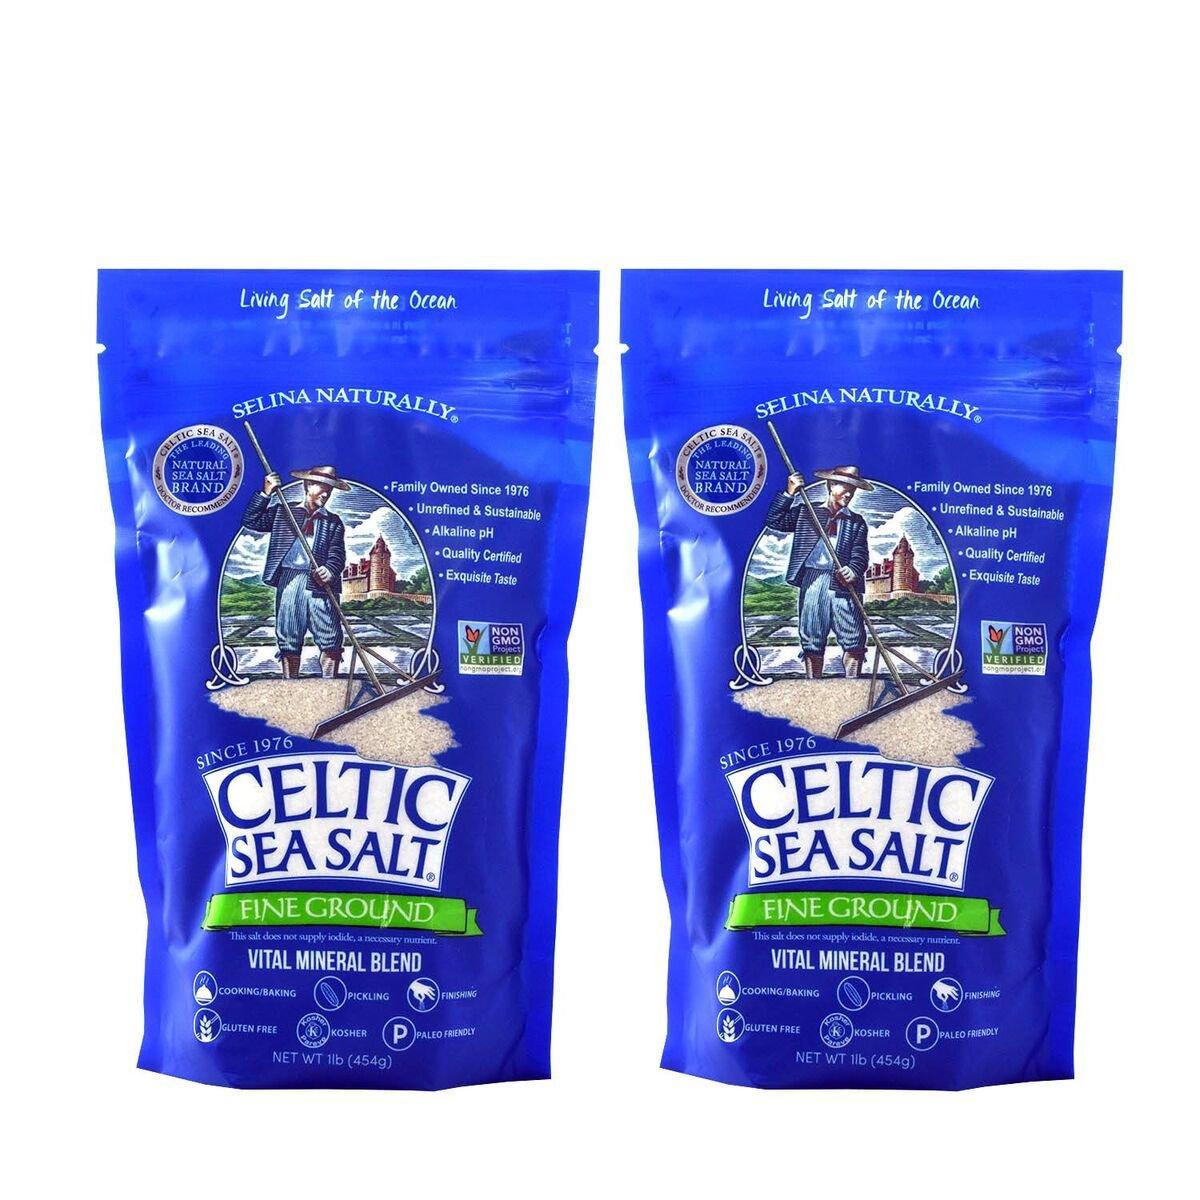 Celtic Sea Salt Resealable Bags, Fine Ground, 1 Pound, 2 Count